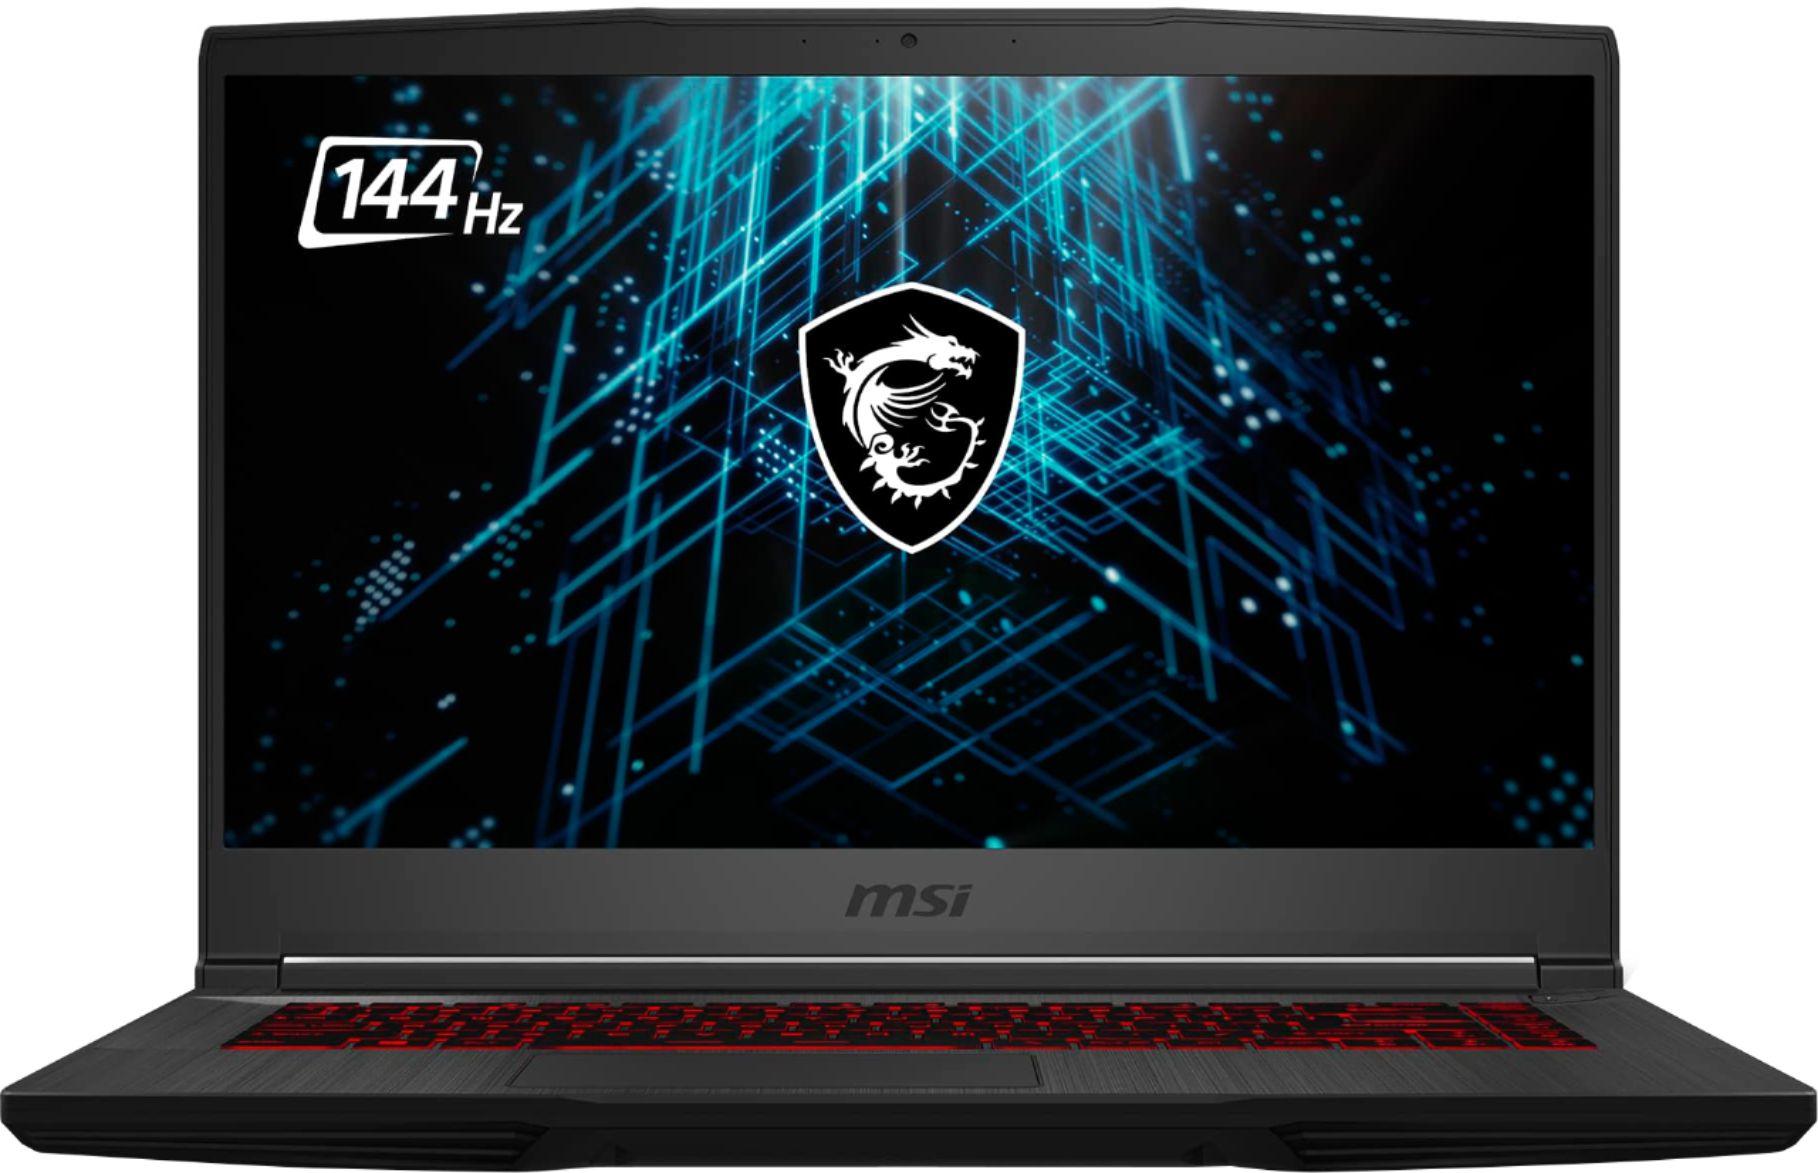 MSI GF65 - i5 10500H, RTX3060, 512GB SSD, 8GB DDR4, 1080P 144Hz $999.99 at Best Buy $949.99